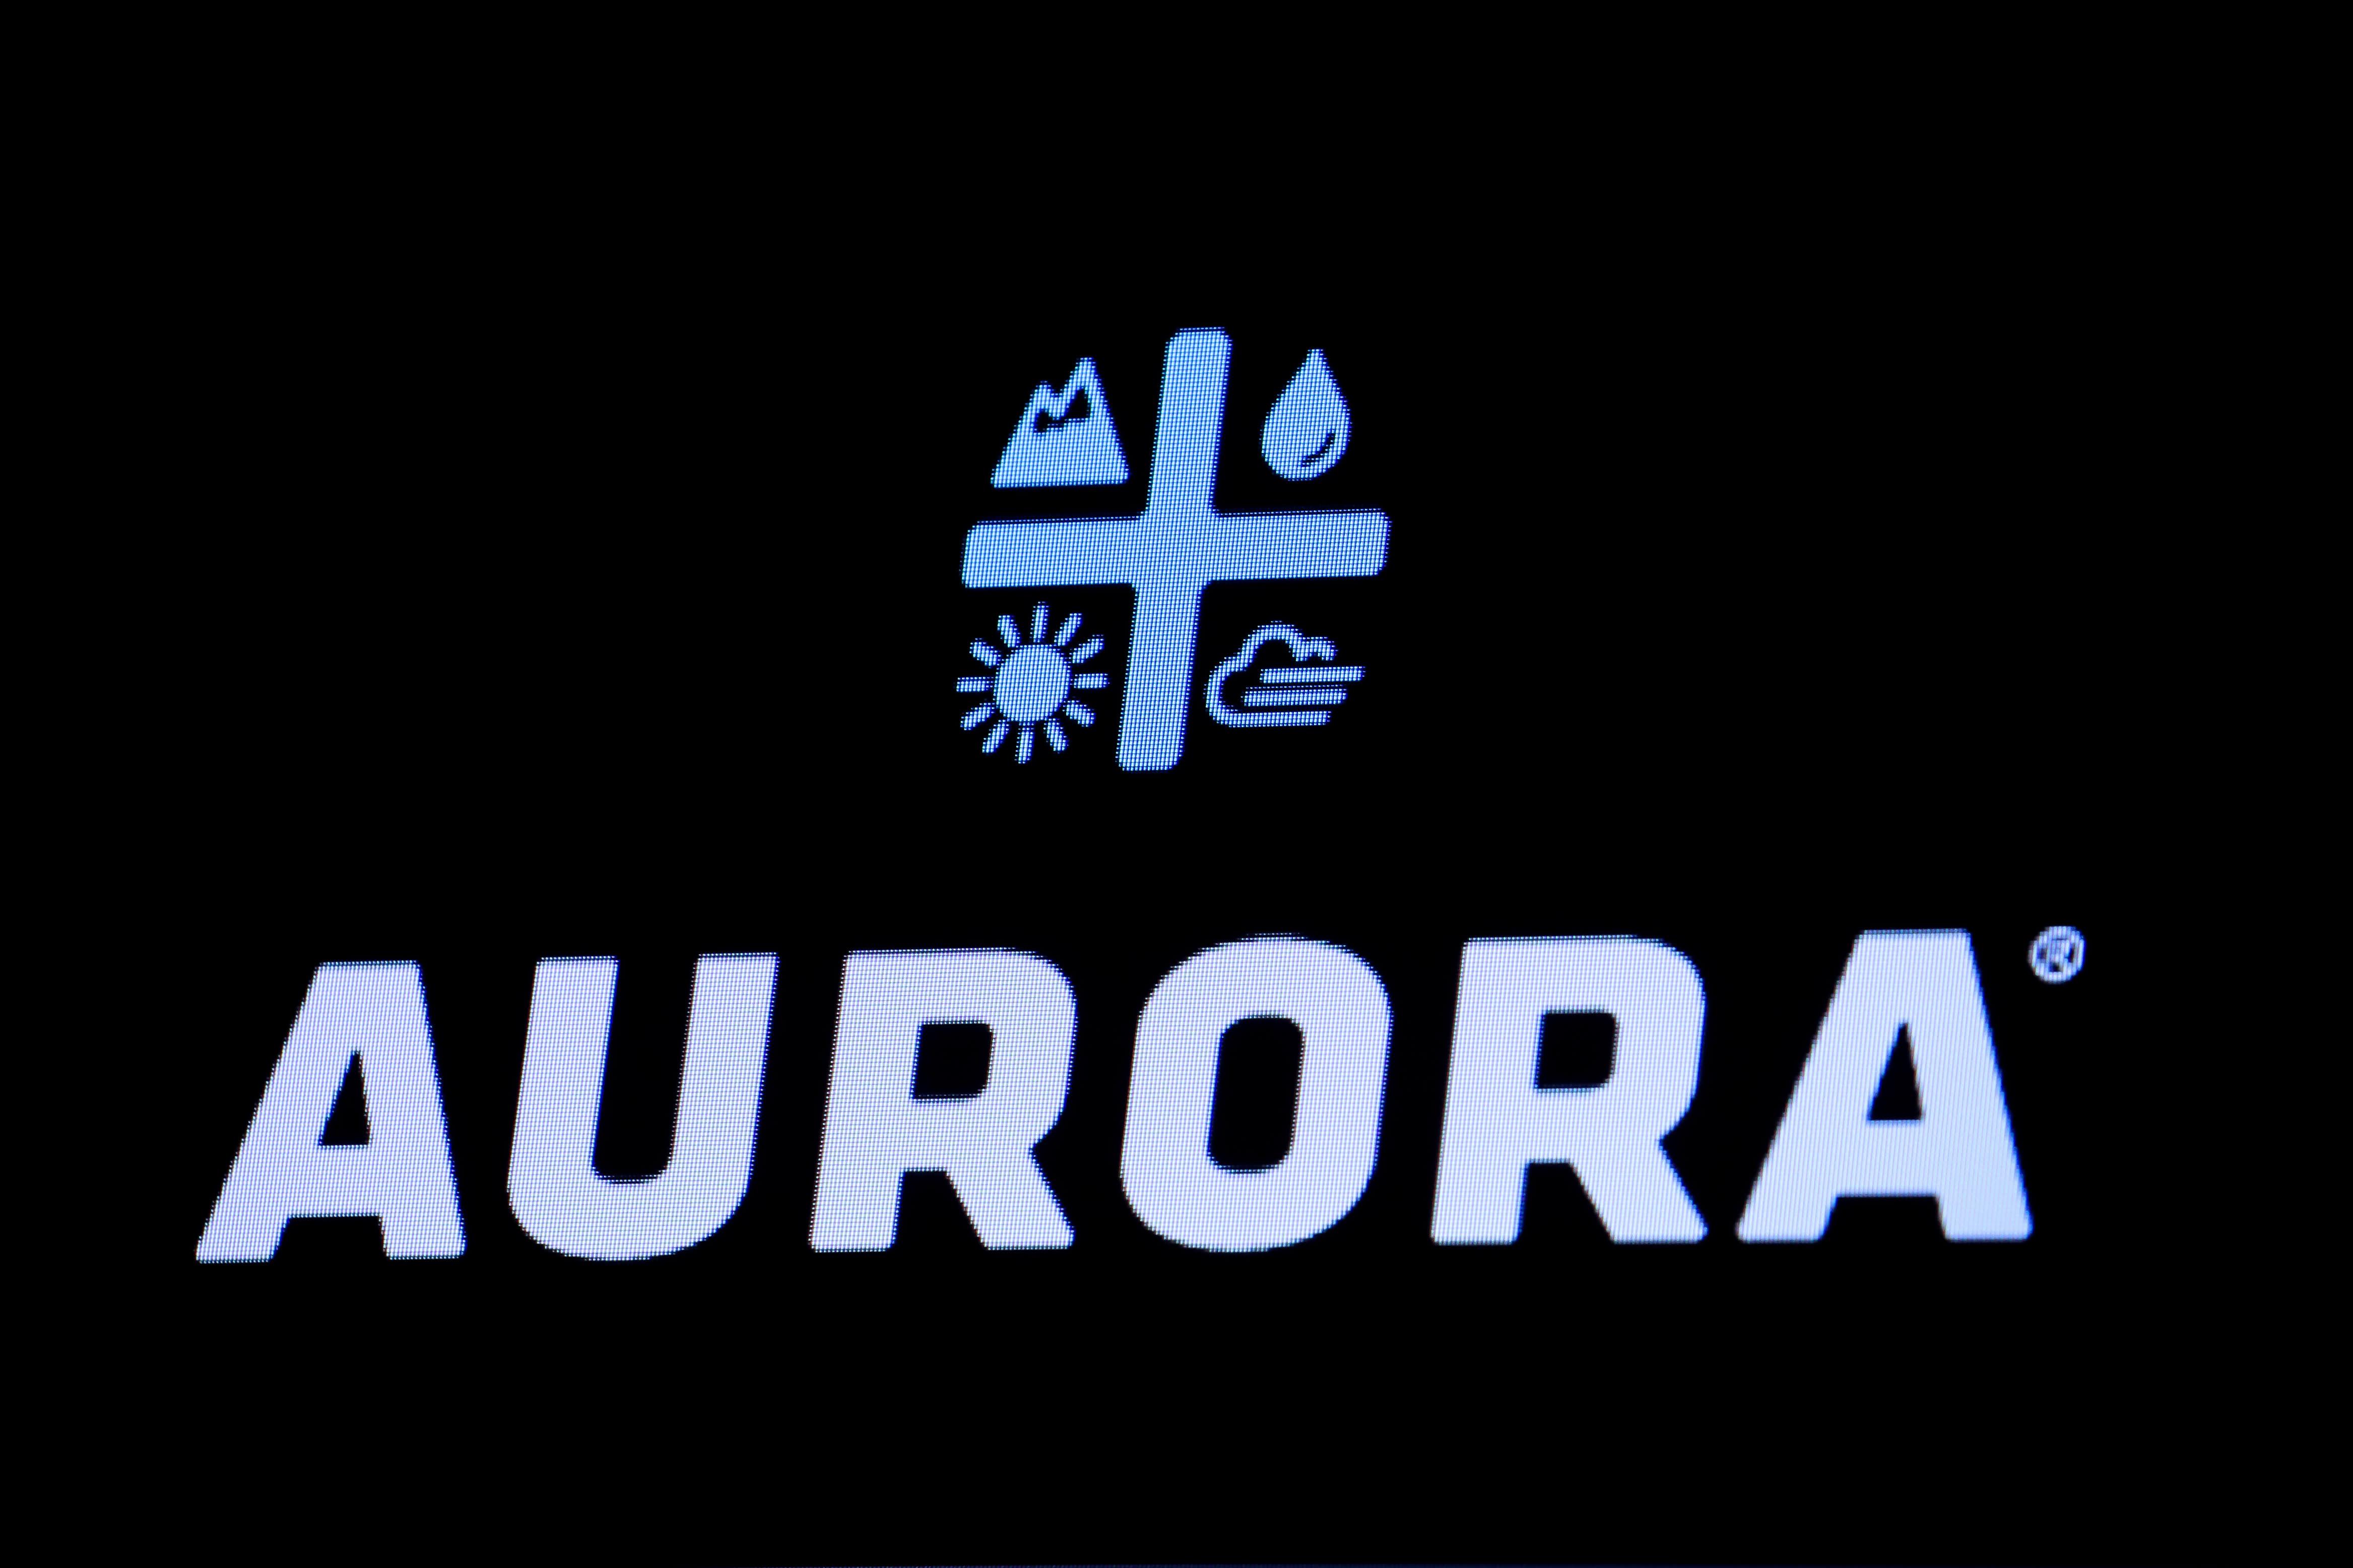 'Aurora is burning cash': Bank of America downgrades cannabis producer